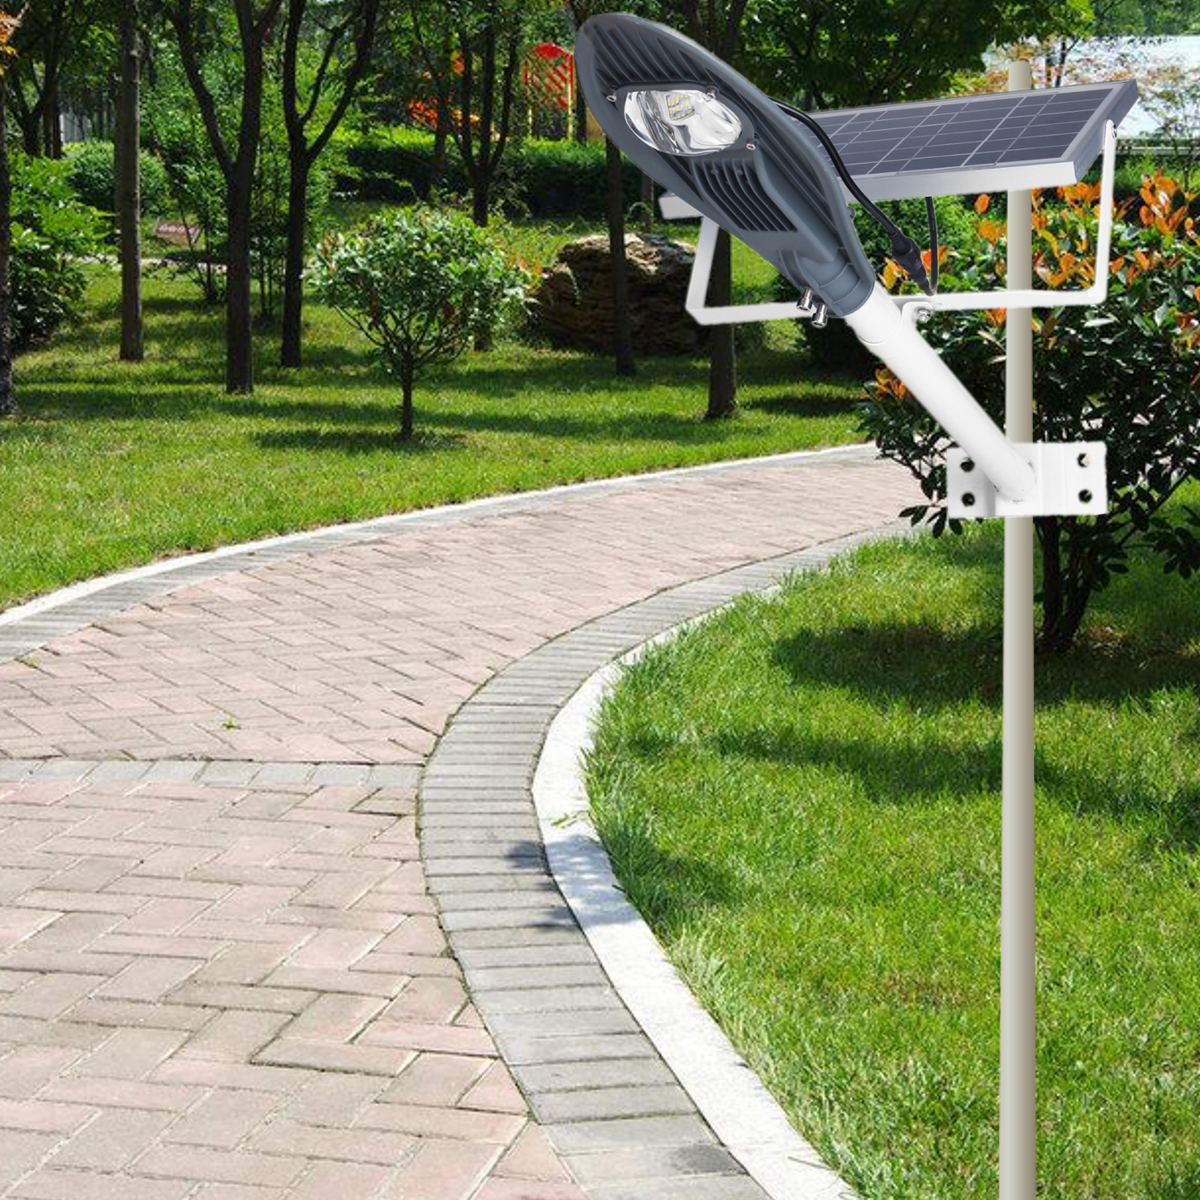 10W Solar Light Motion Sensor Outdoor Garden Waterproof Wall Lamp Zinc Alloy IP65 Light Sensor Control Energy Conservation sink mobility models for sensor energy conservation